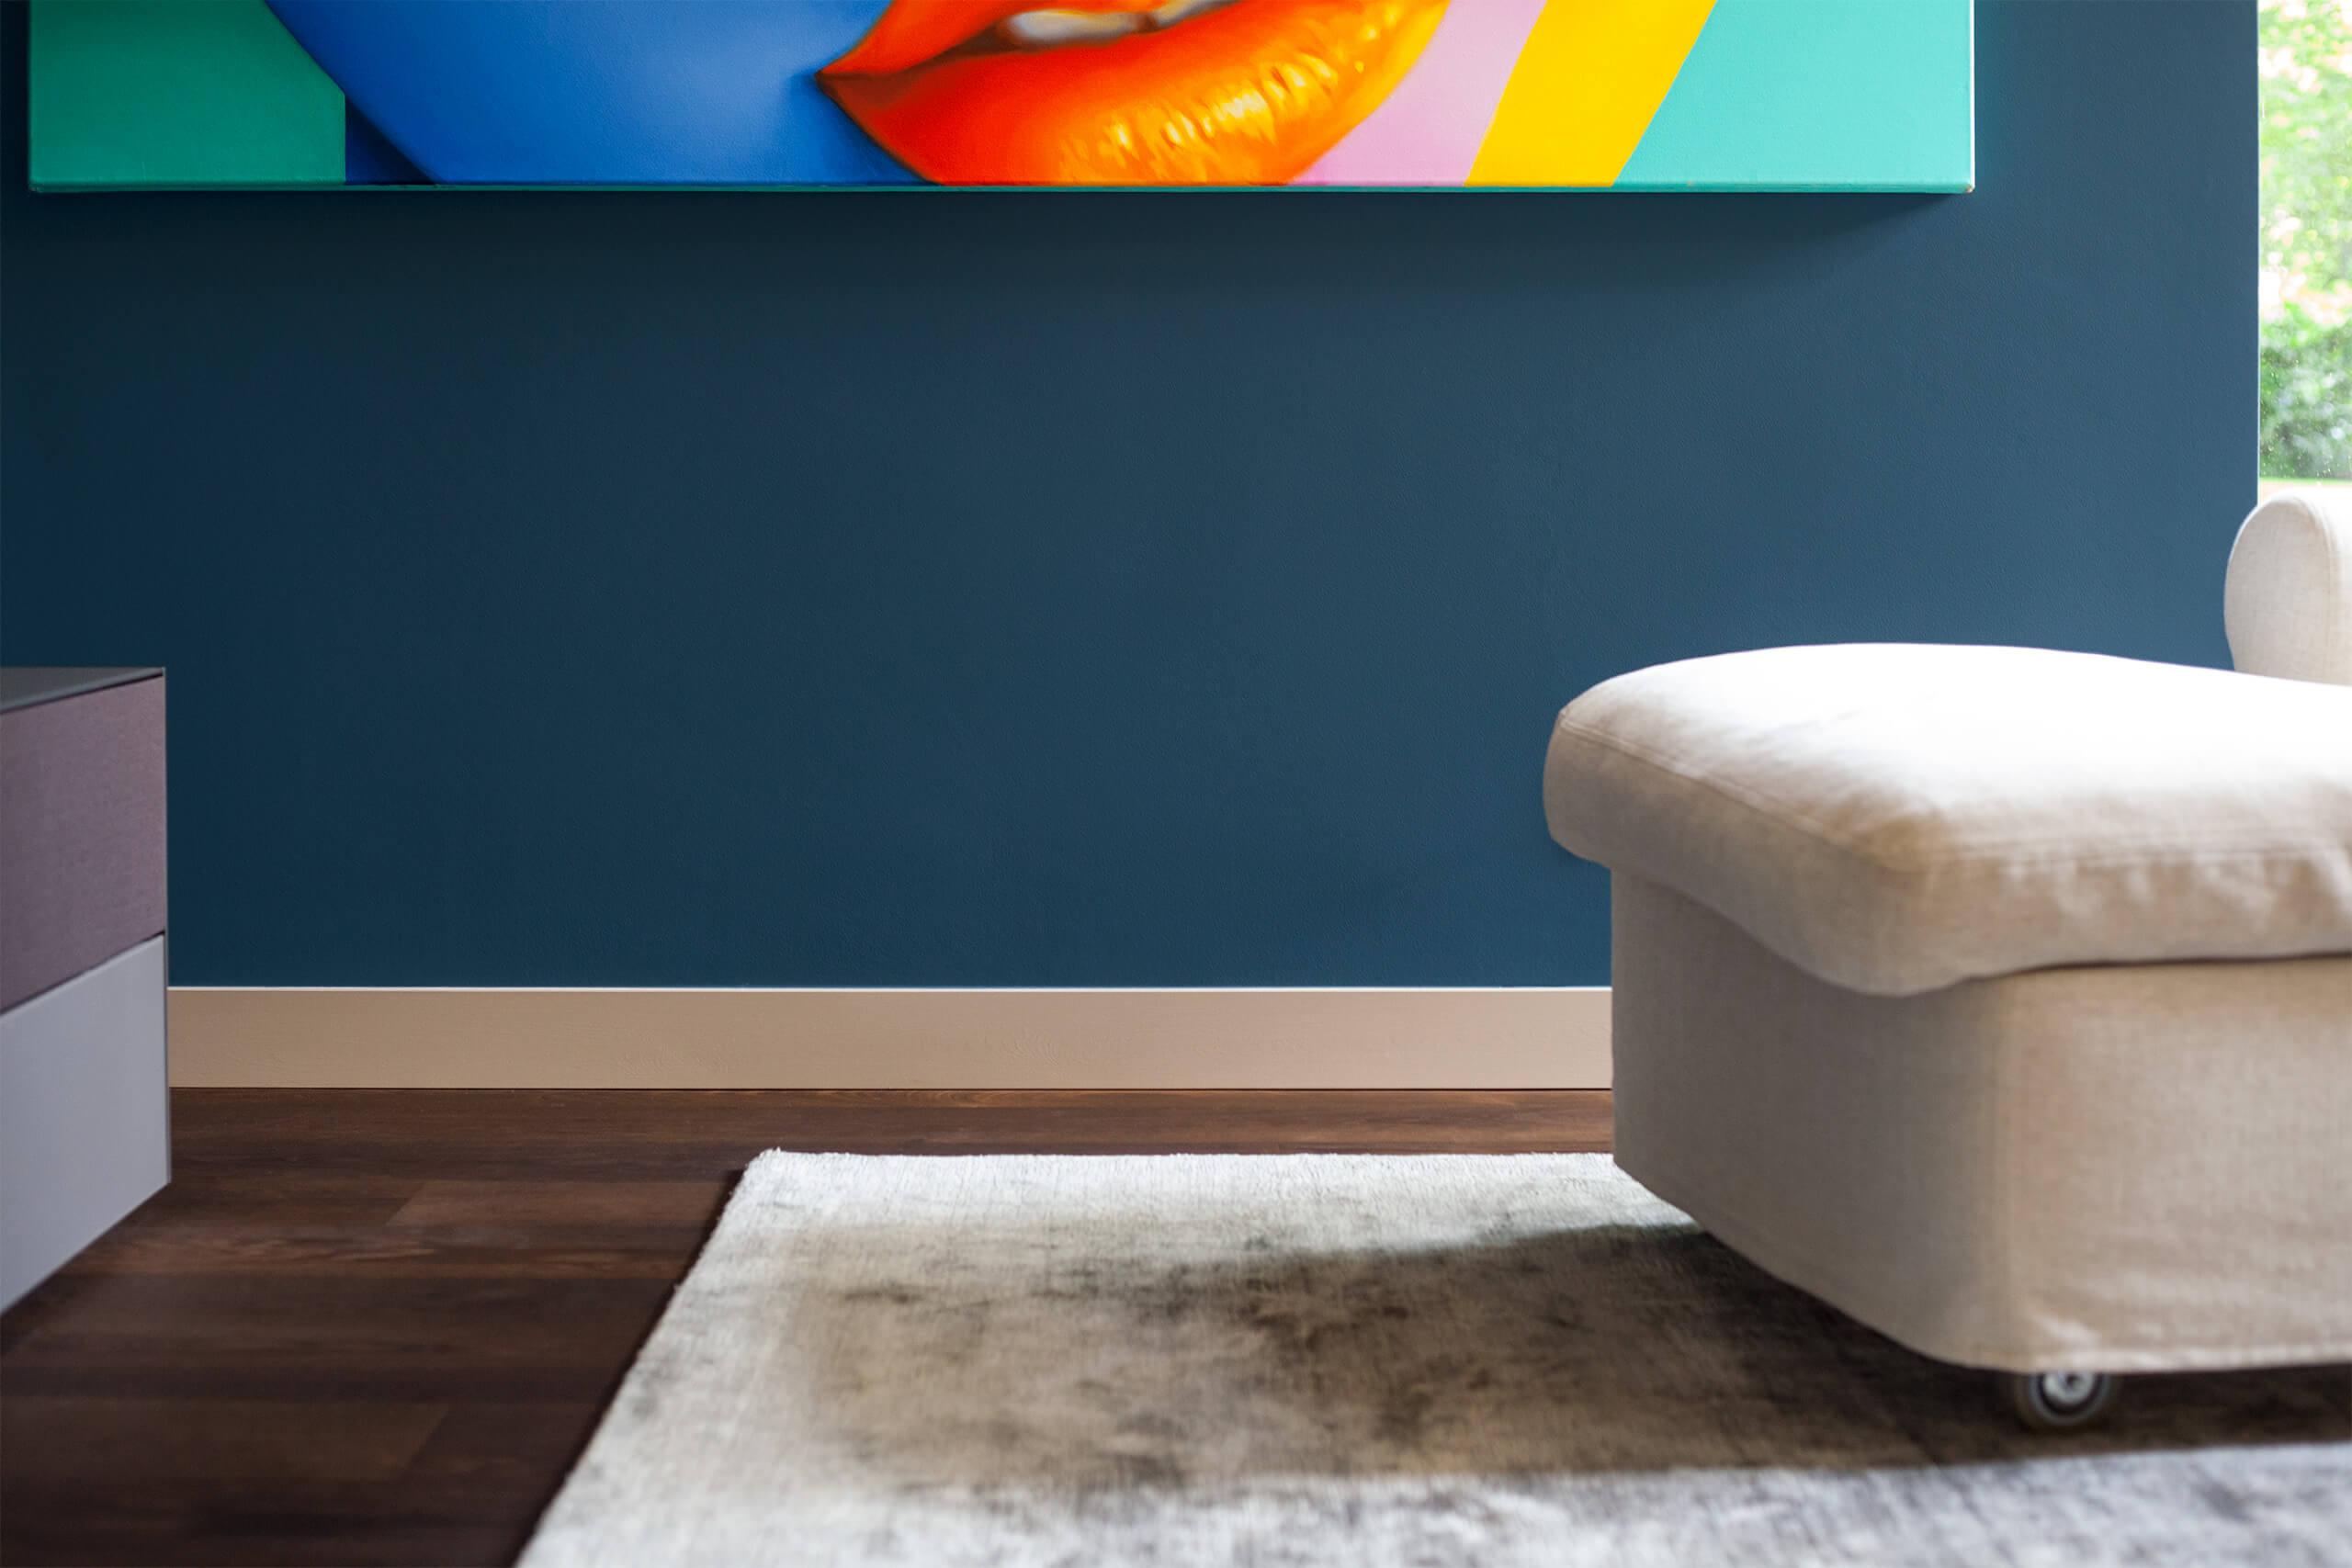 farrow ball s hague blue adler wohndesign. Black Bedroom Furniture Sets. Home Design Ideas